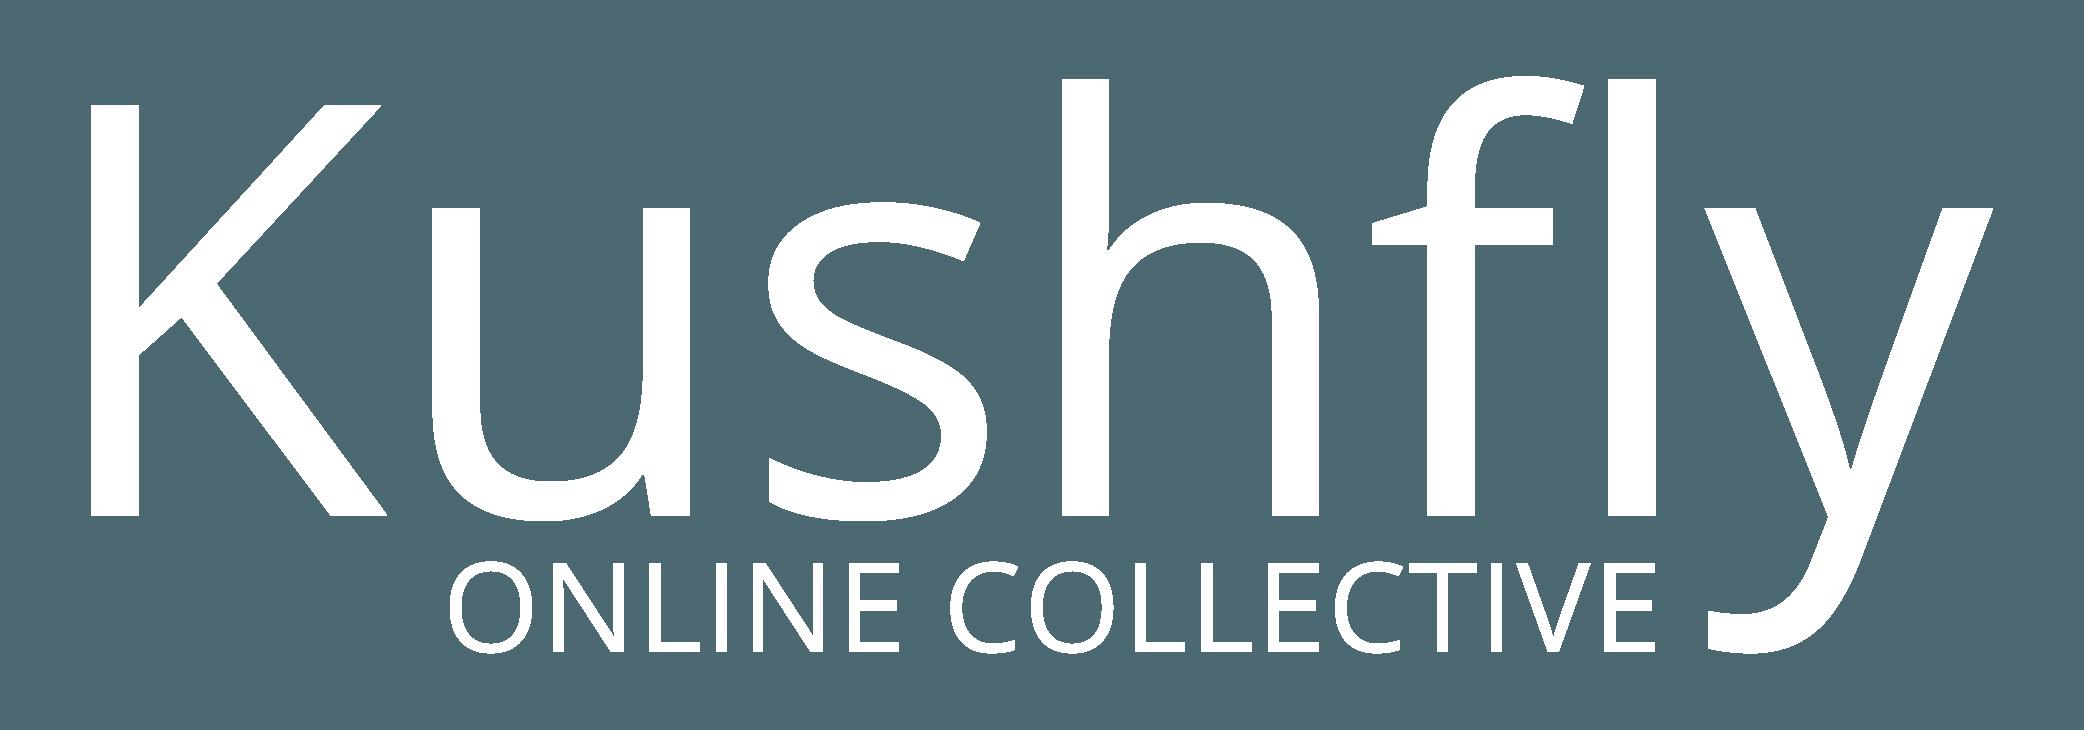 Kushfly Online Collective